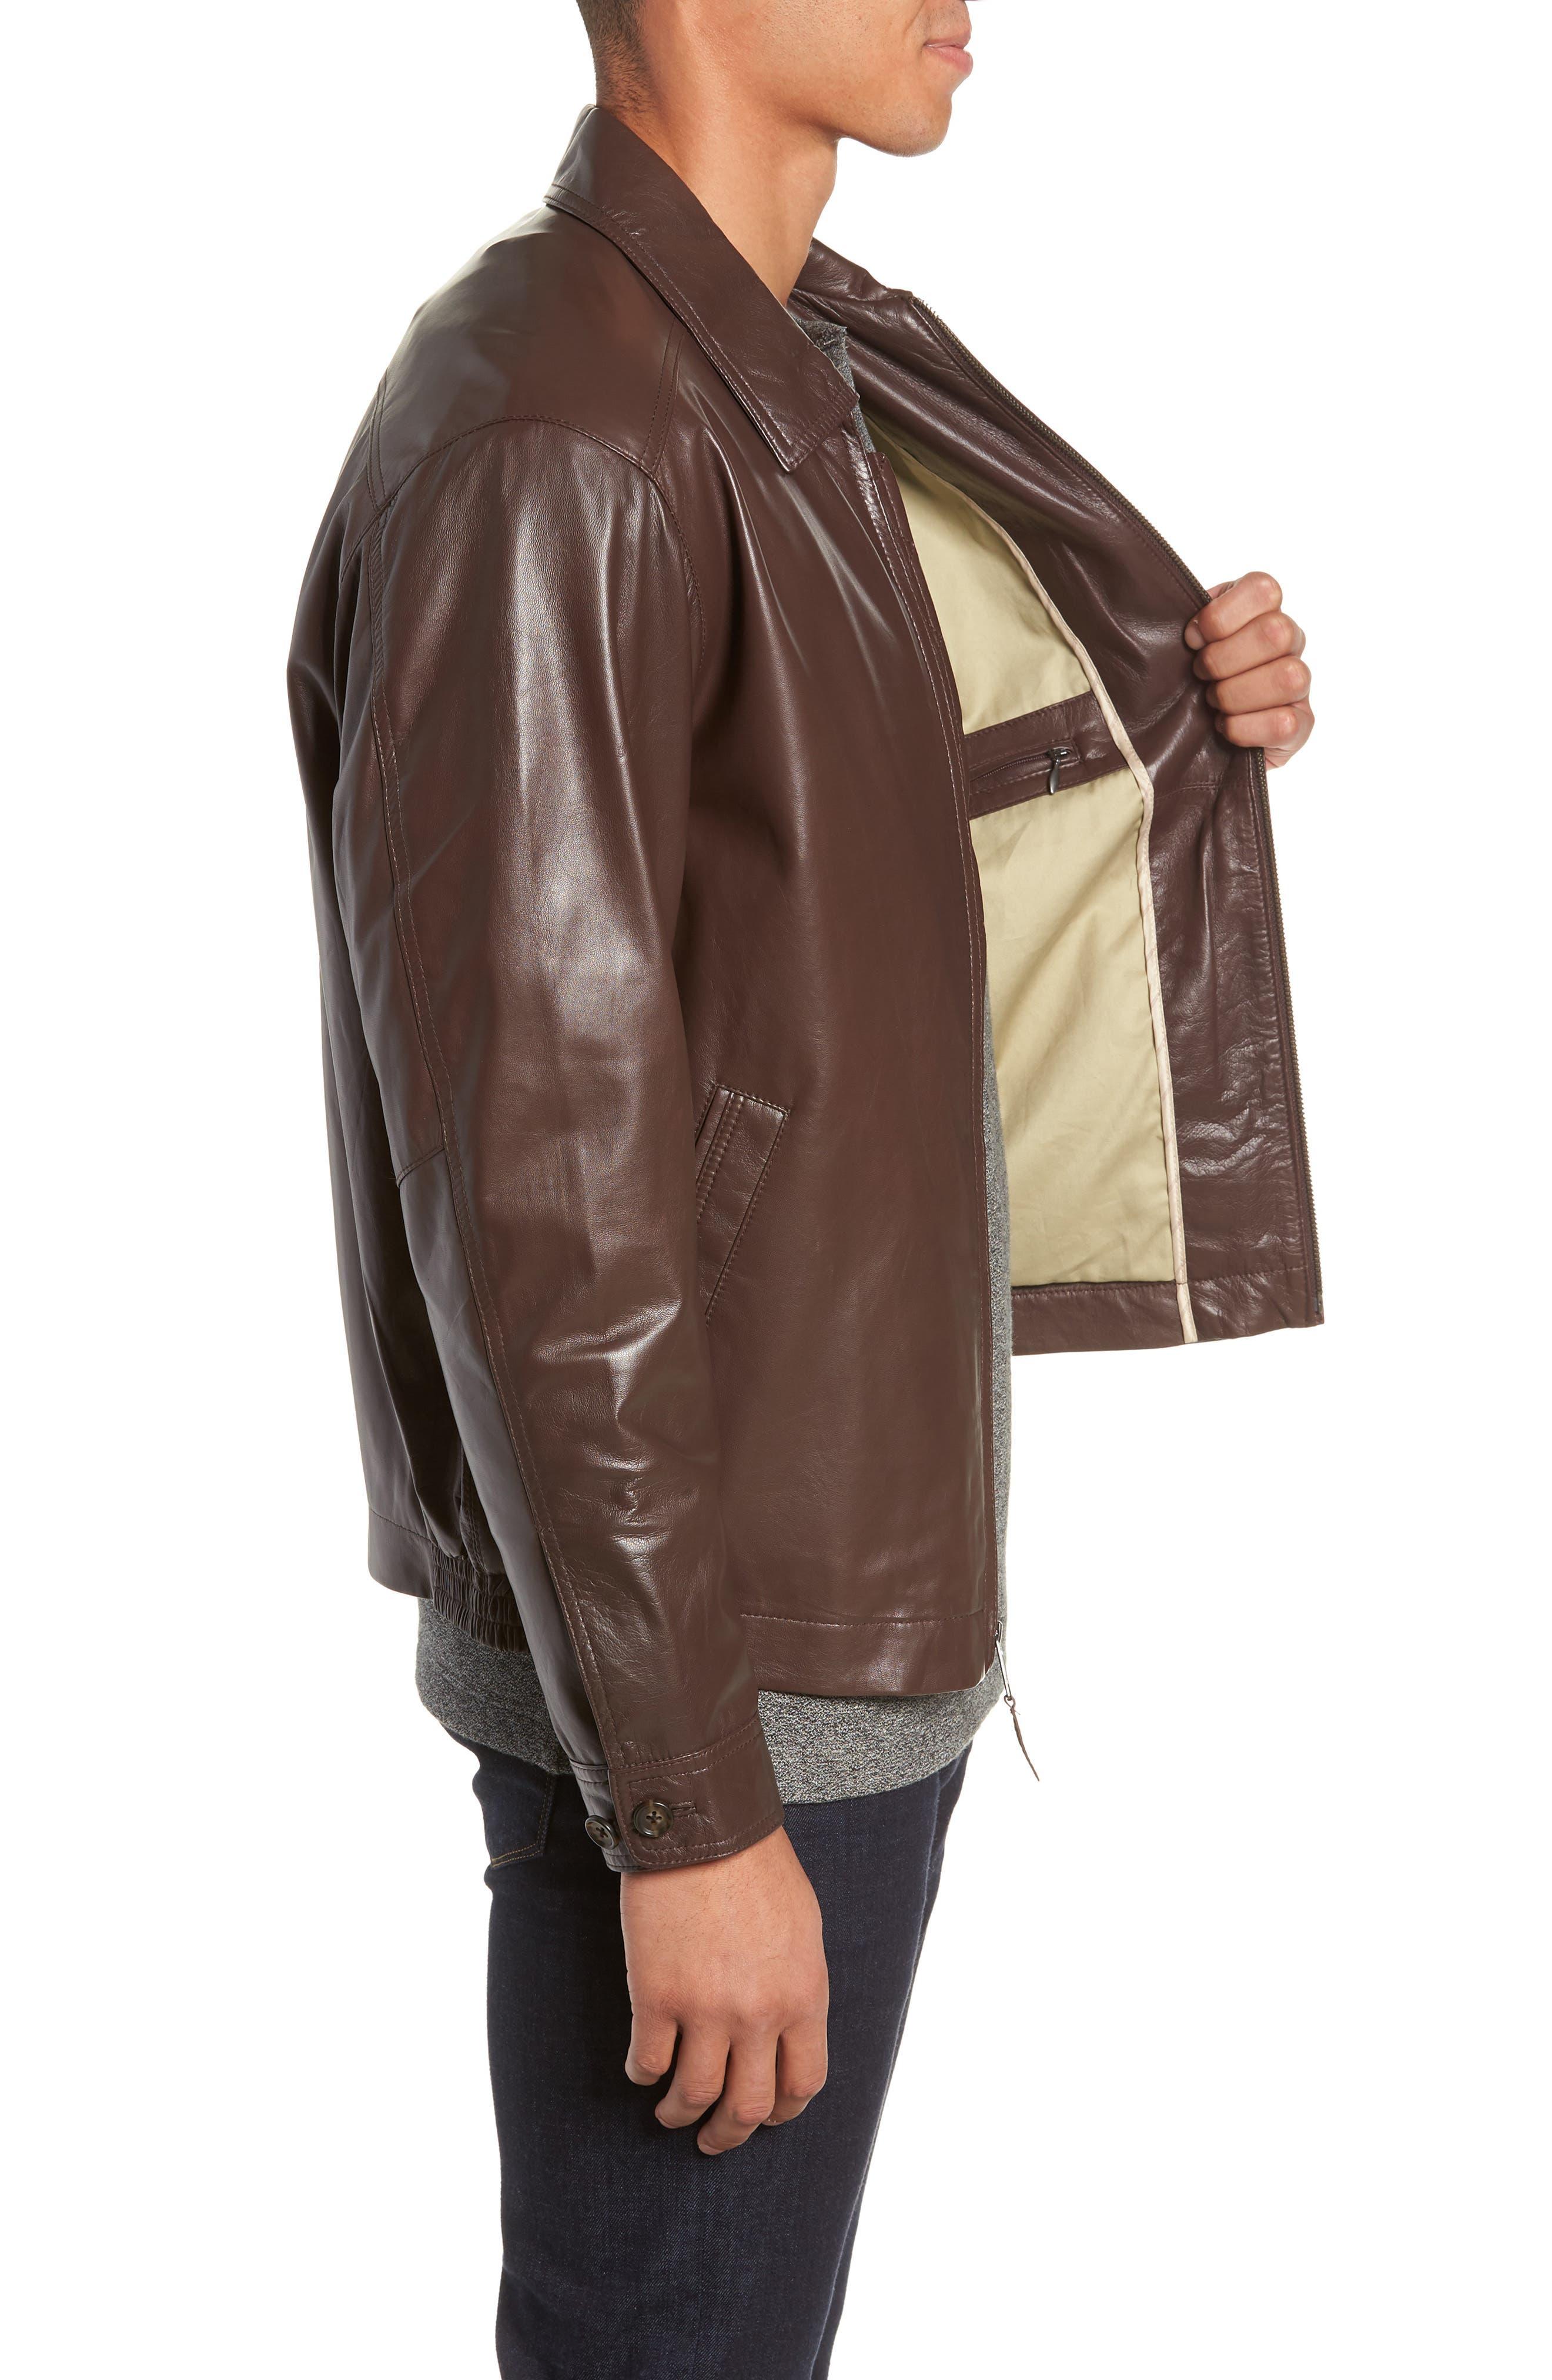 GOLDEN BEAR,                             The Bartlett Leather Jacket,                             Alternate thumbnail 3, color,                             DARK BROWN